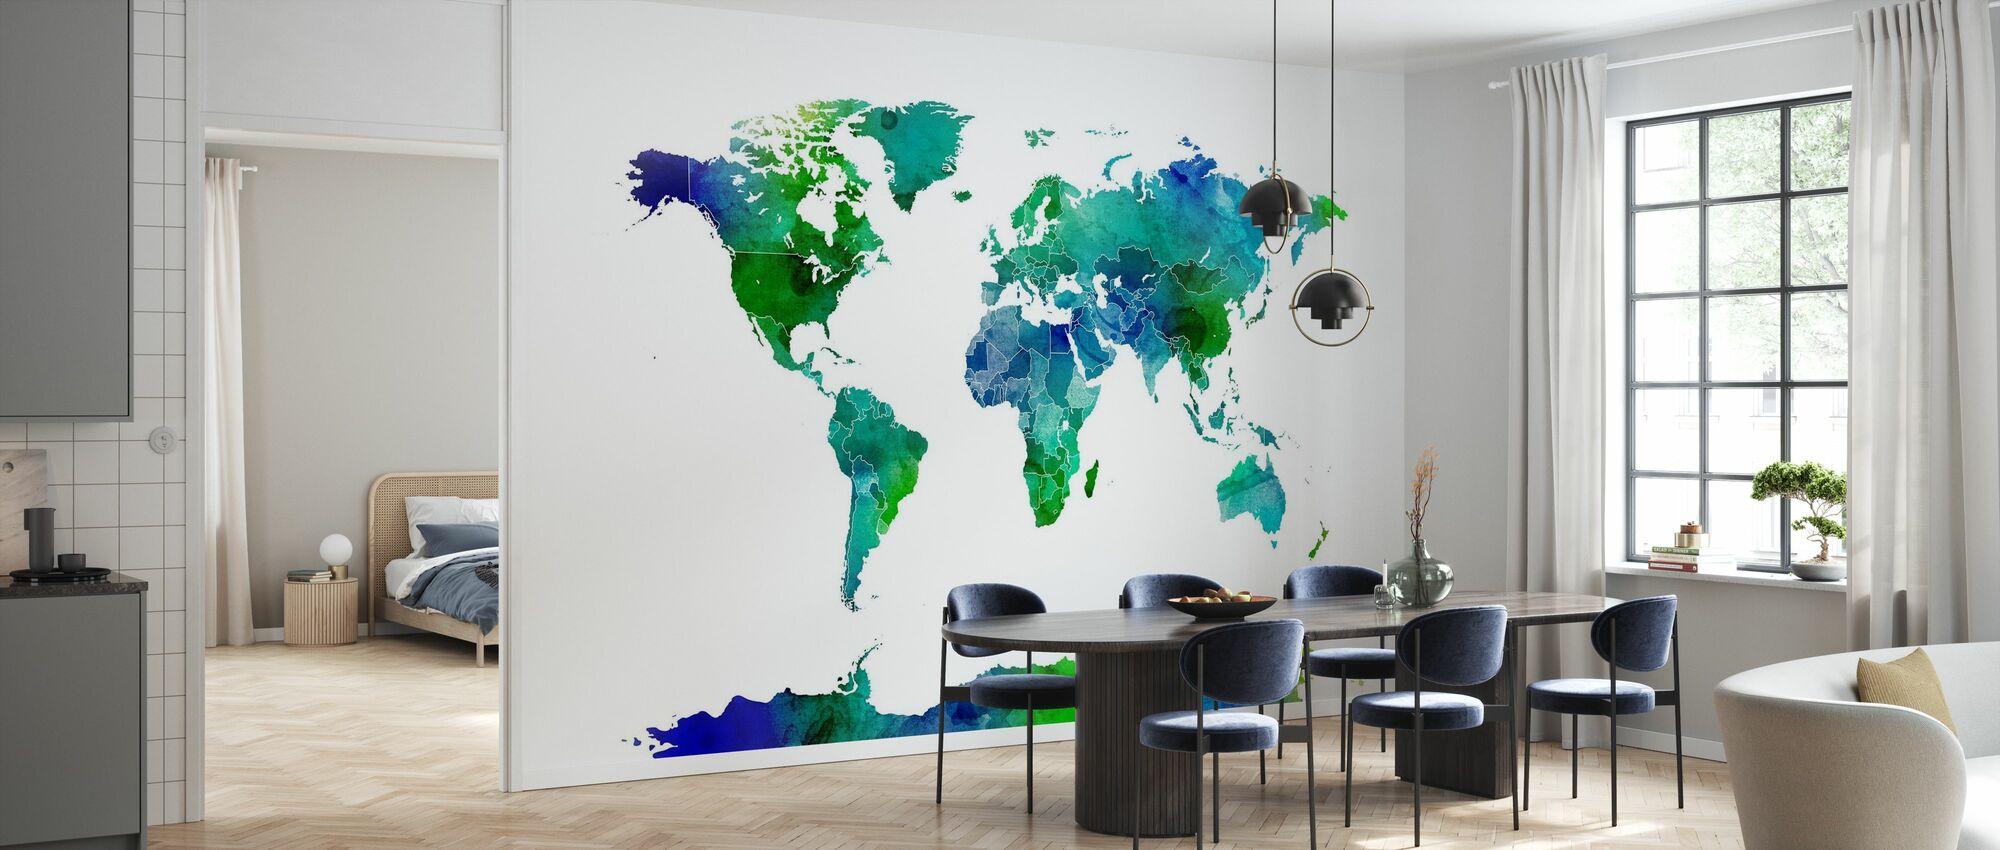 Watercolor World Map Blue & Green - Wallpaper - Kitchen